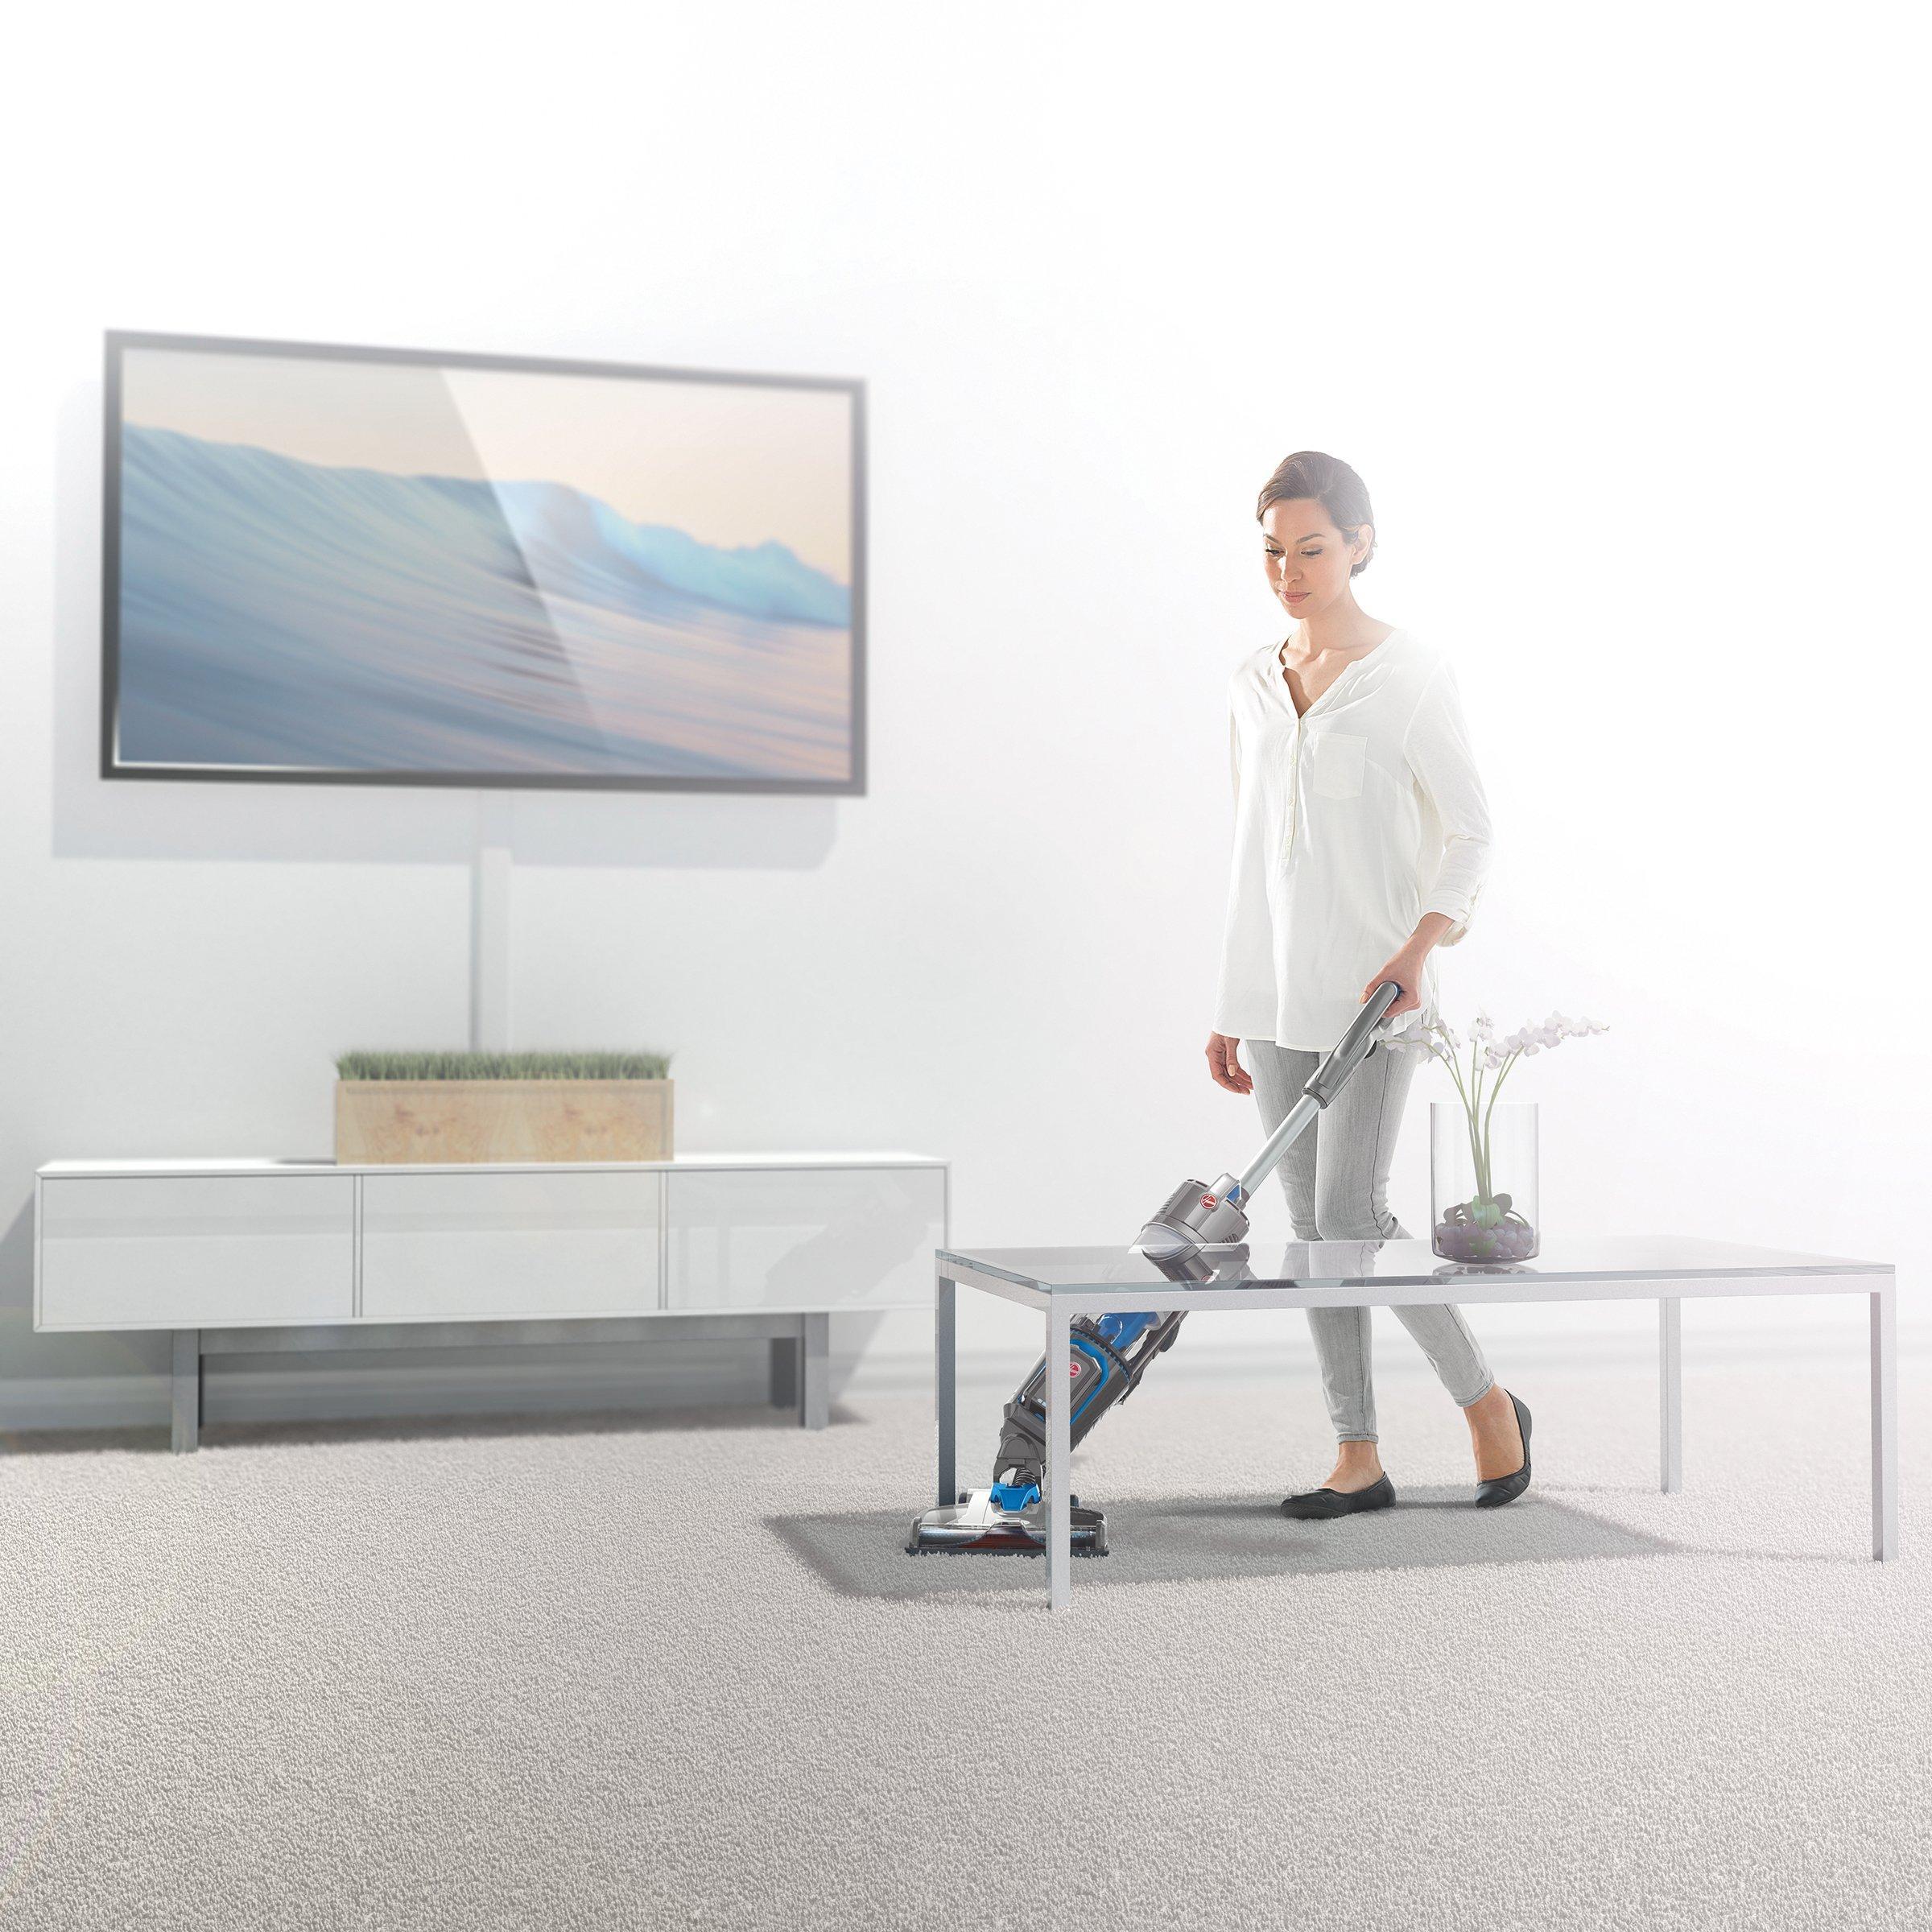 Air™ Cordless Series 1.0 Upright Vacuum5